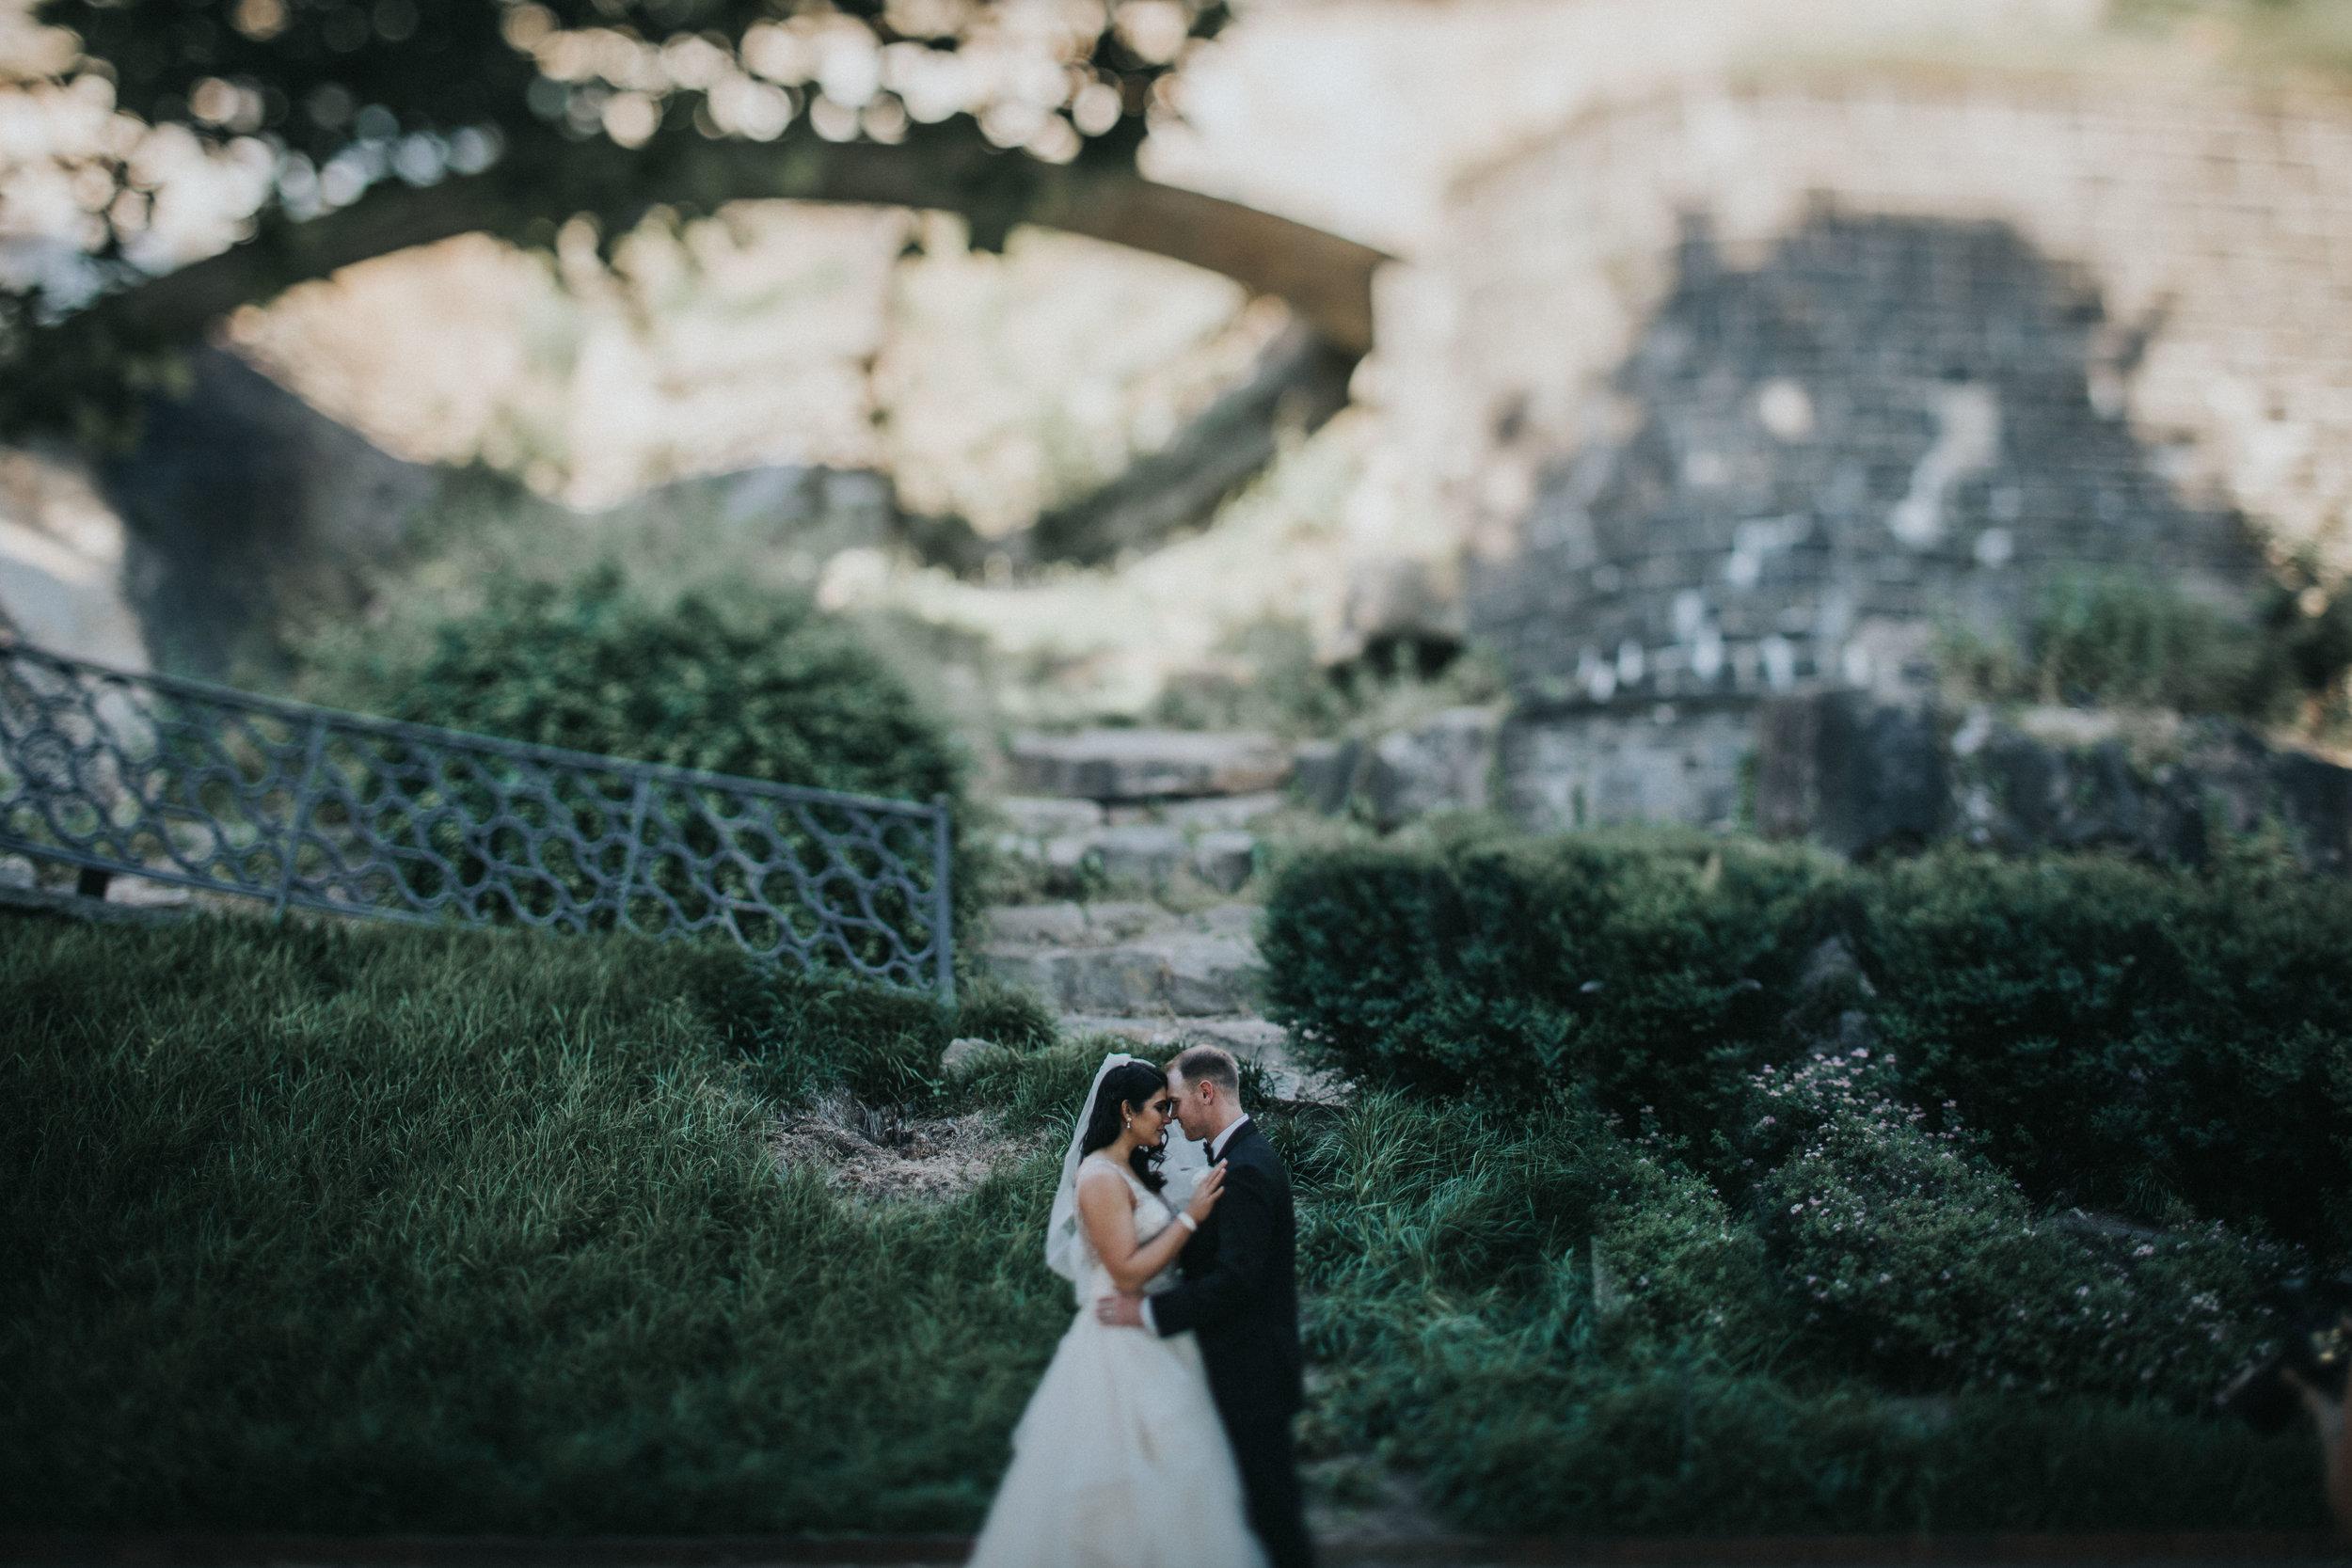 NewJersey_Wedding_Photography_Philadelphia__cescaphe_Waterworks_Bride&Groom-39.jpg